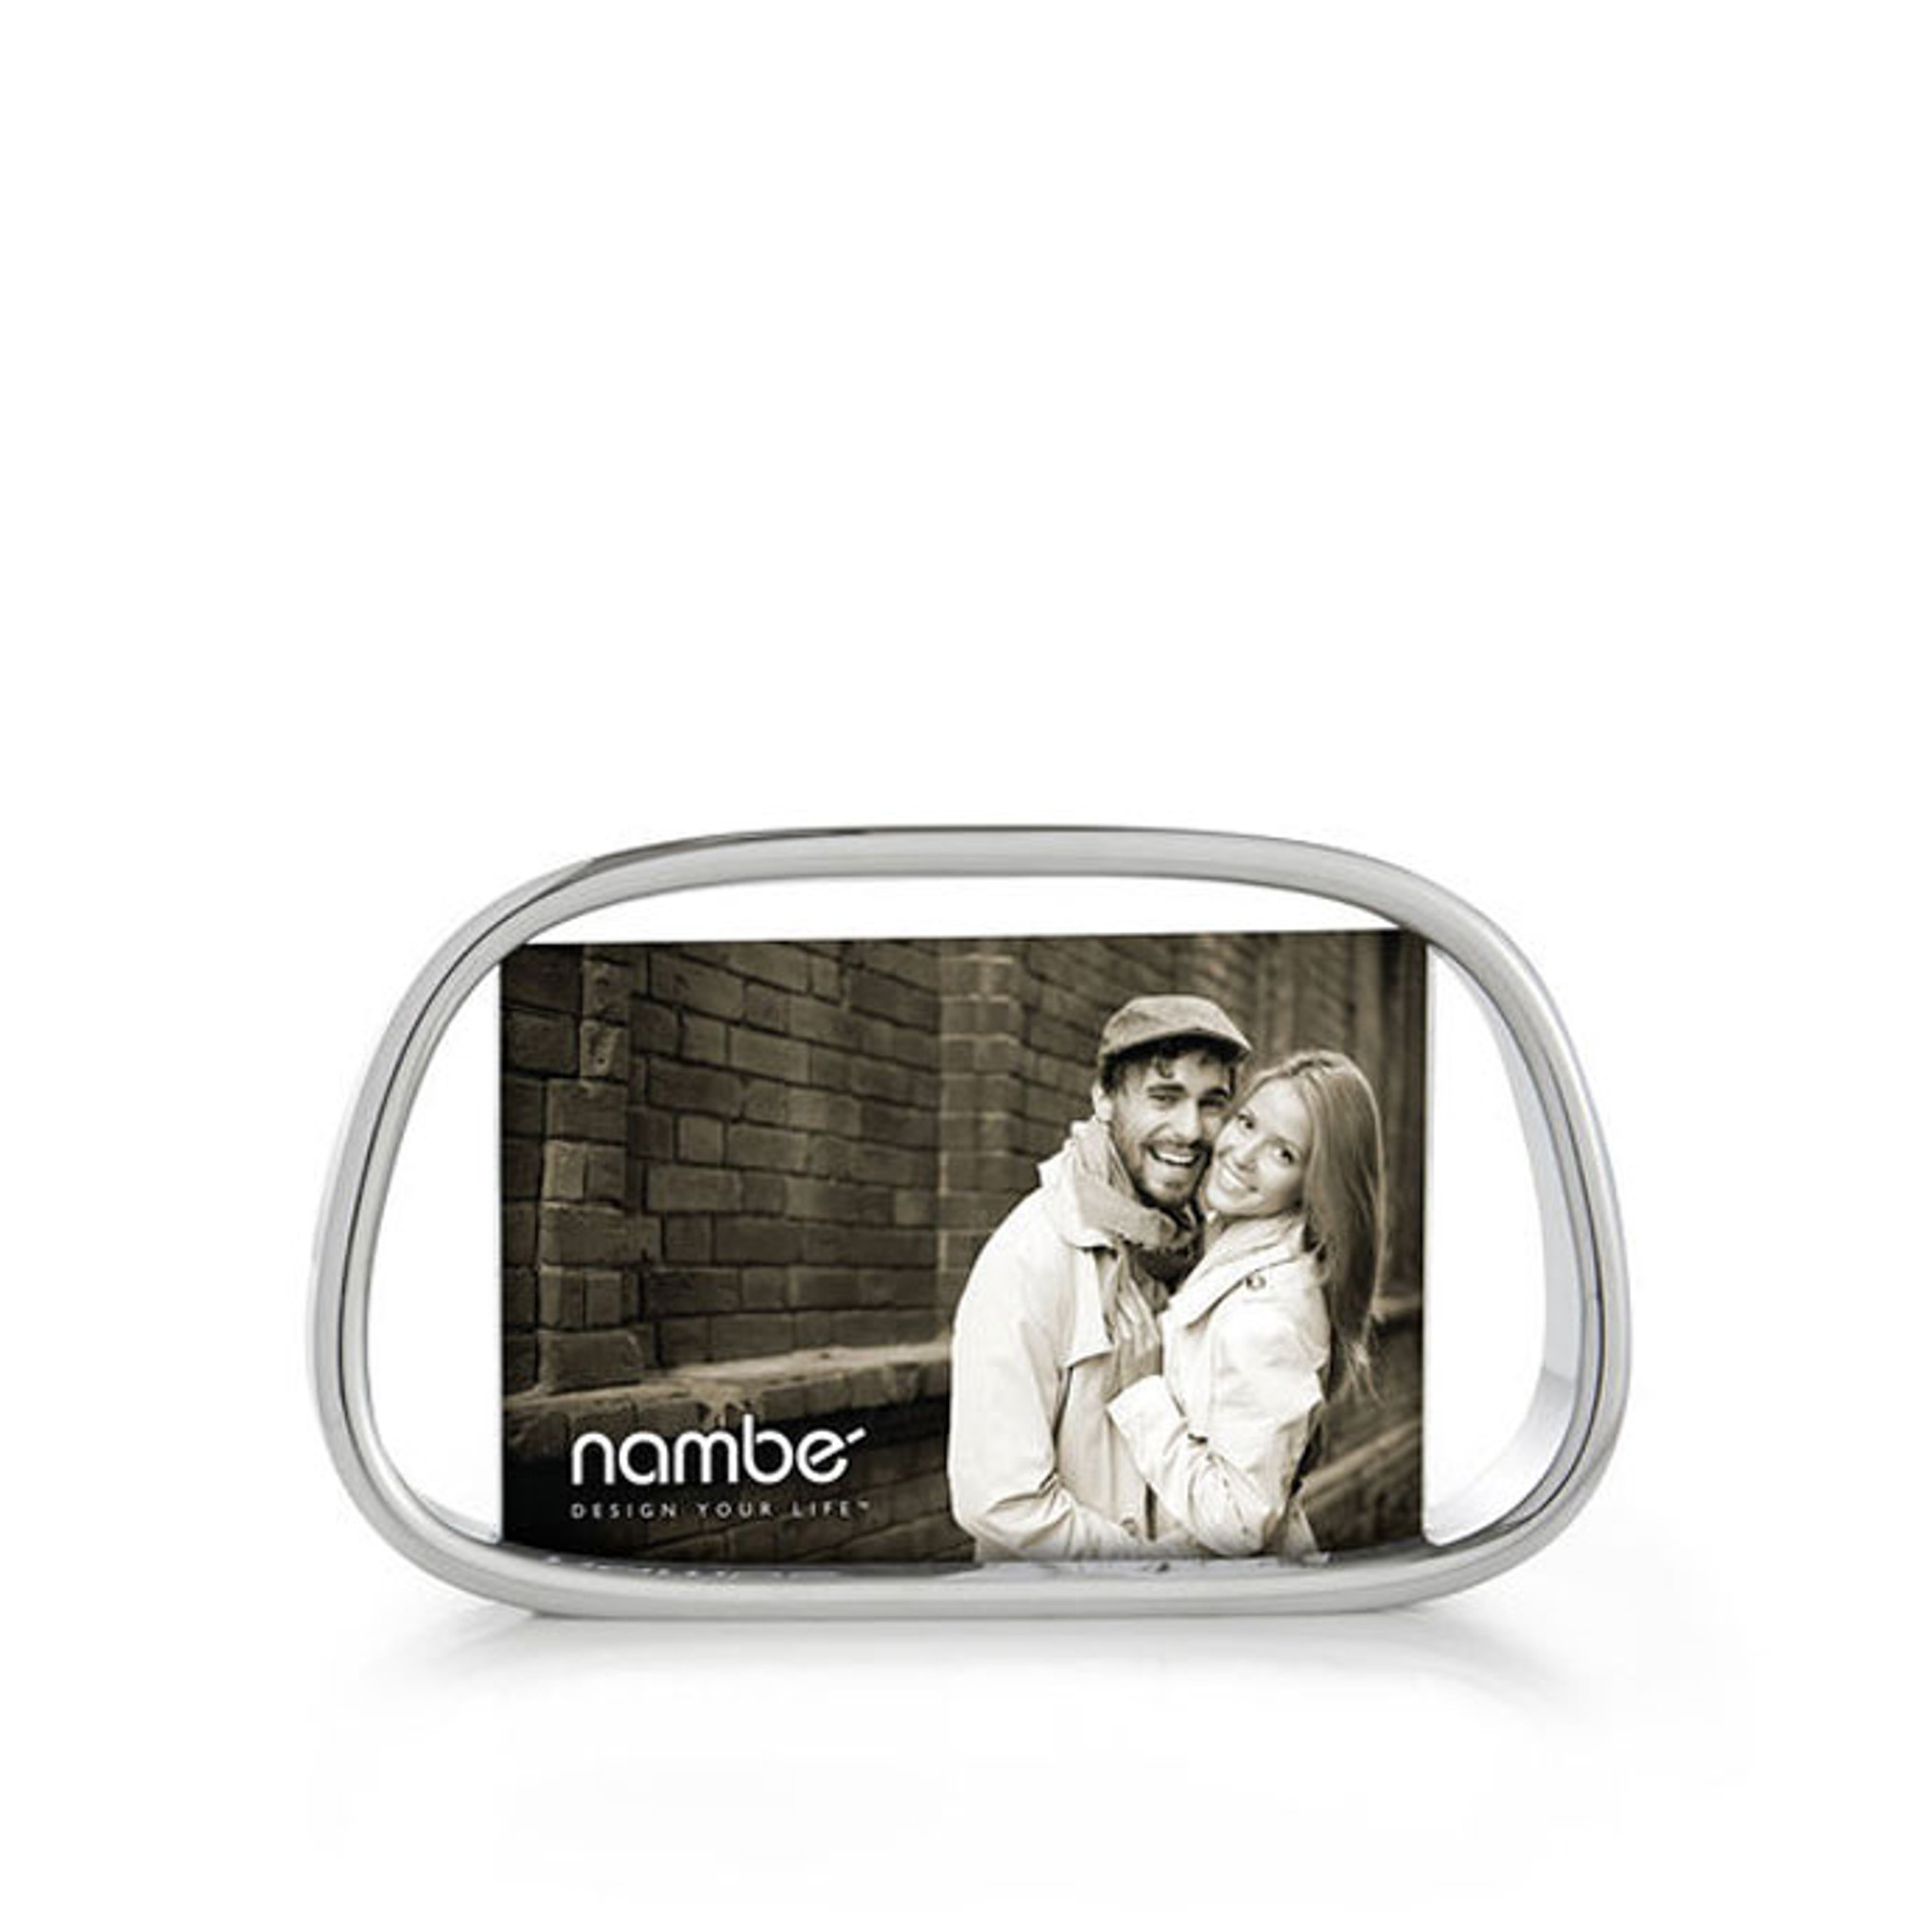 4 x 6 Nambe Hayden Picture Frame